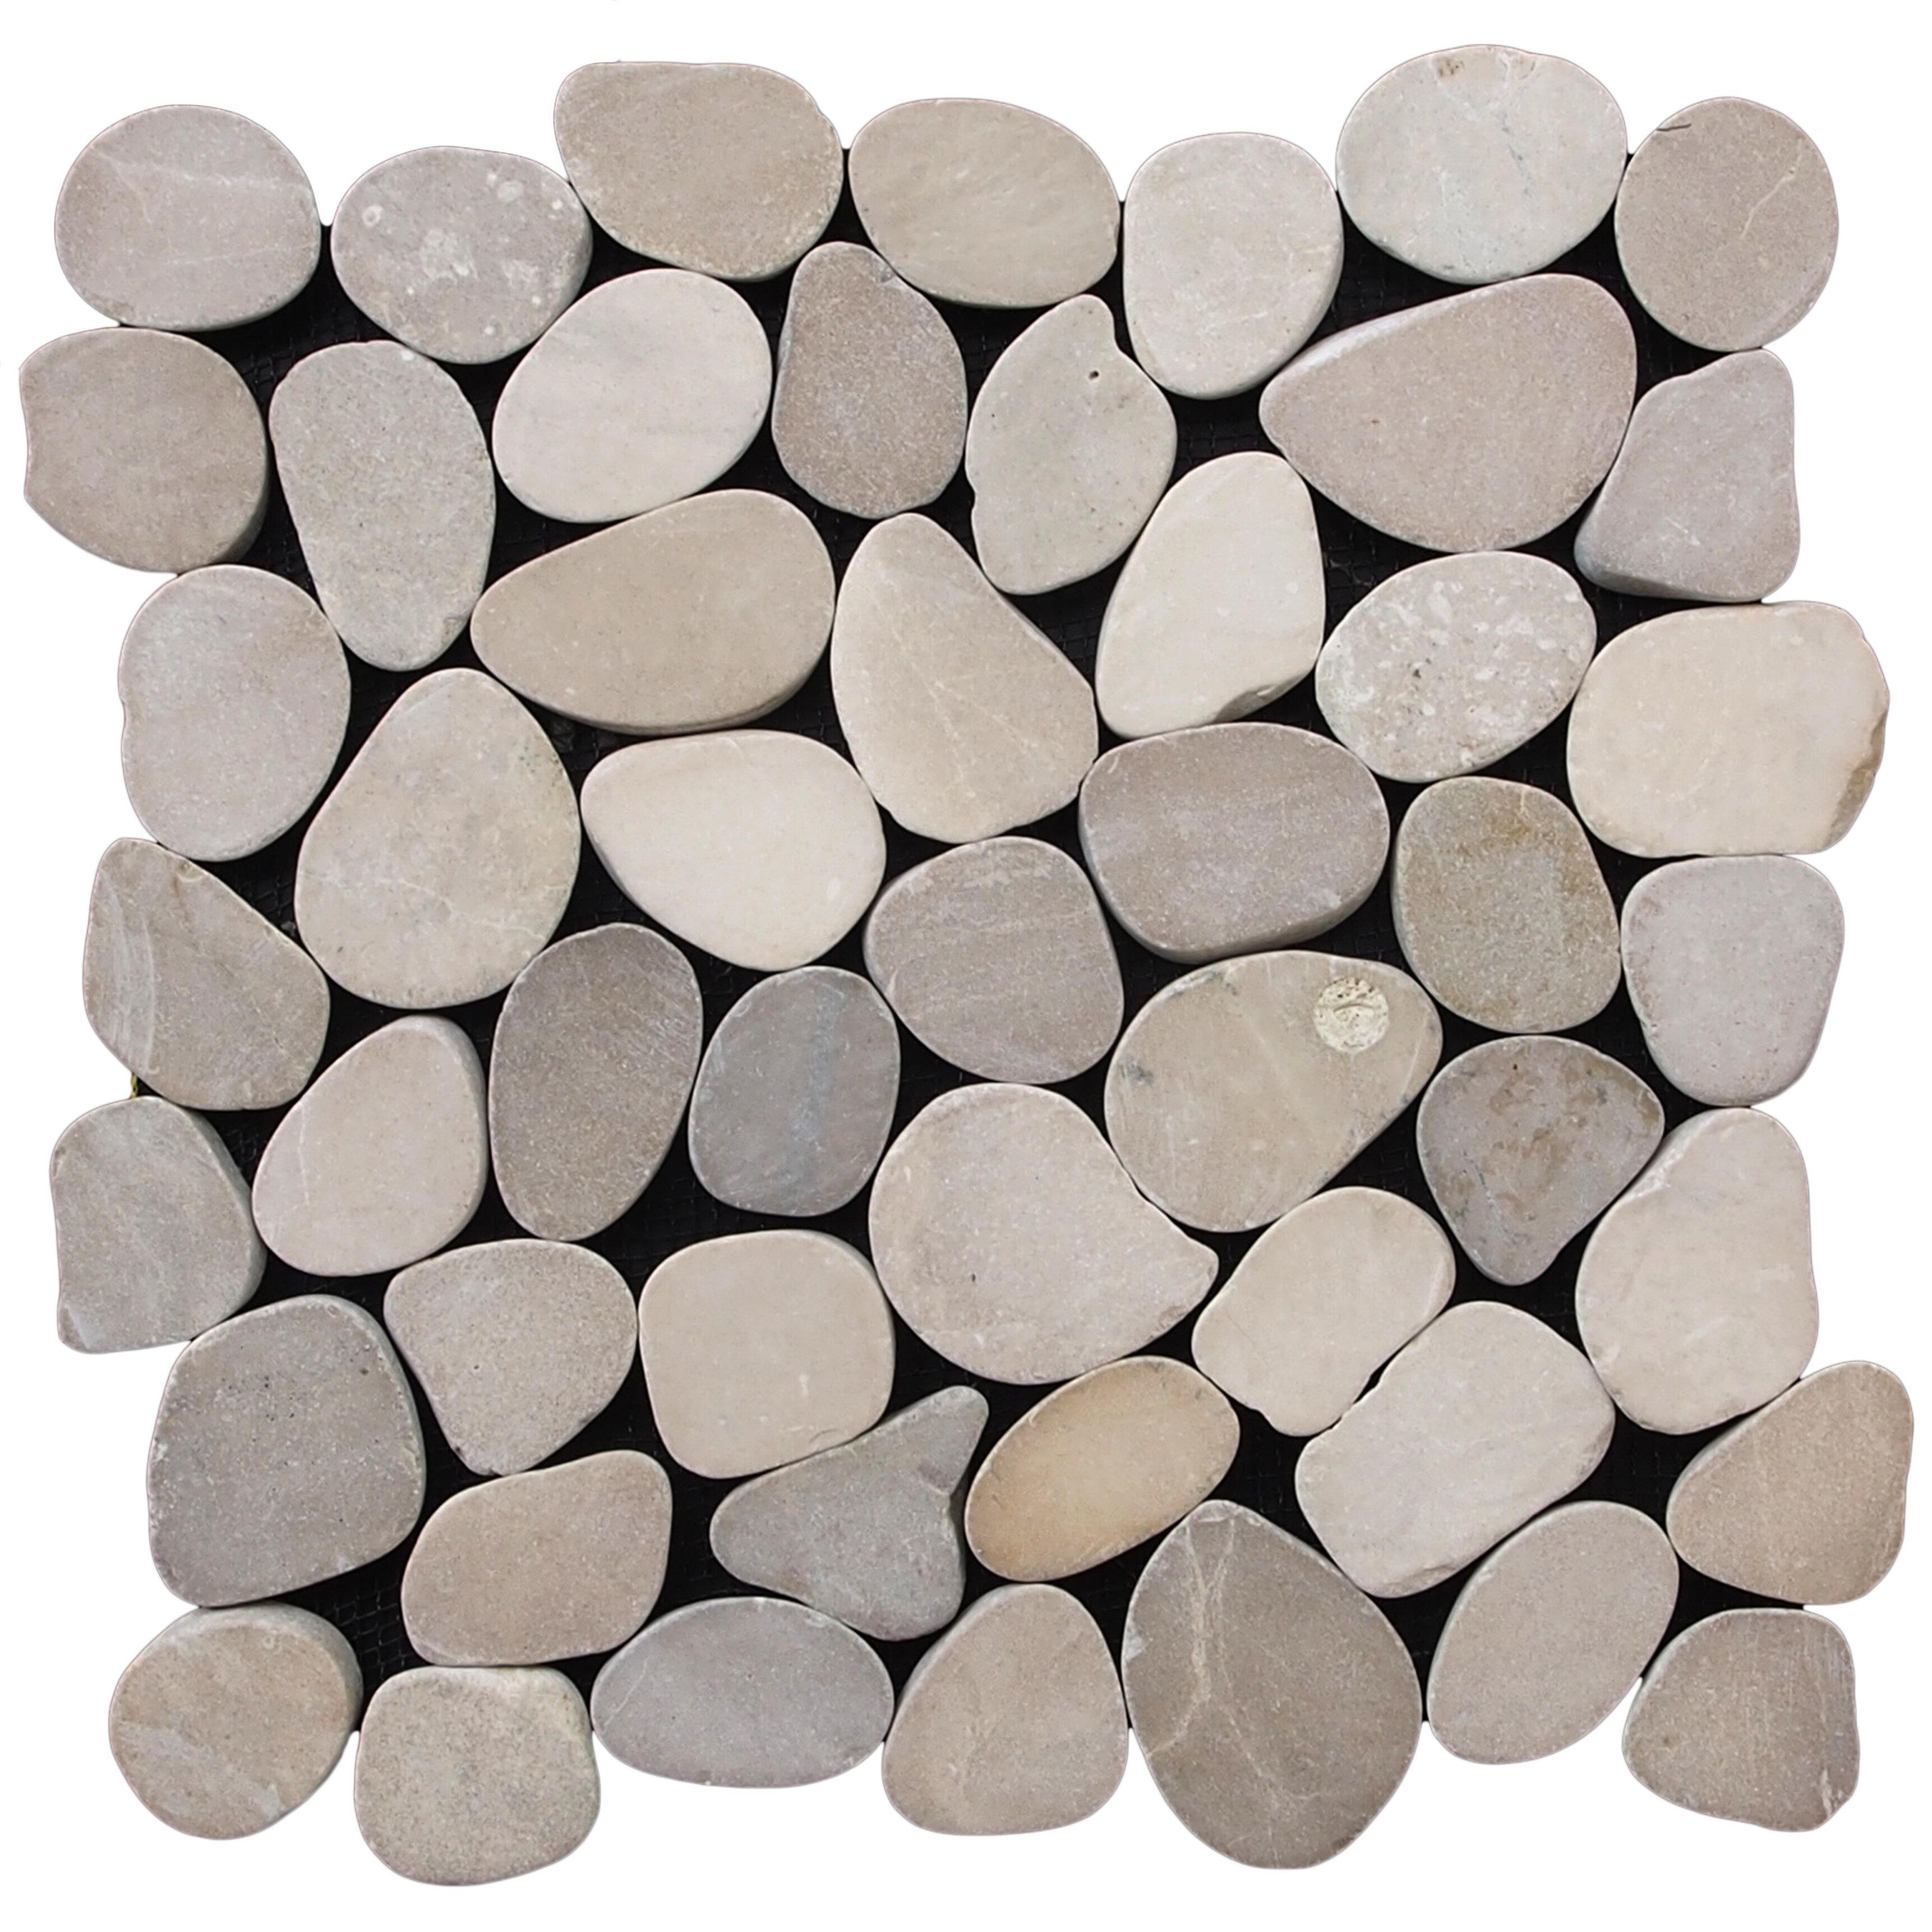 Pebble Tile Sliced Random Sized Natural Stone In Tan Reviews Wayfair